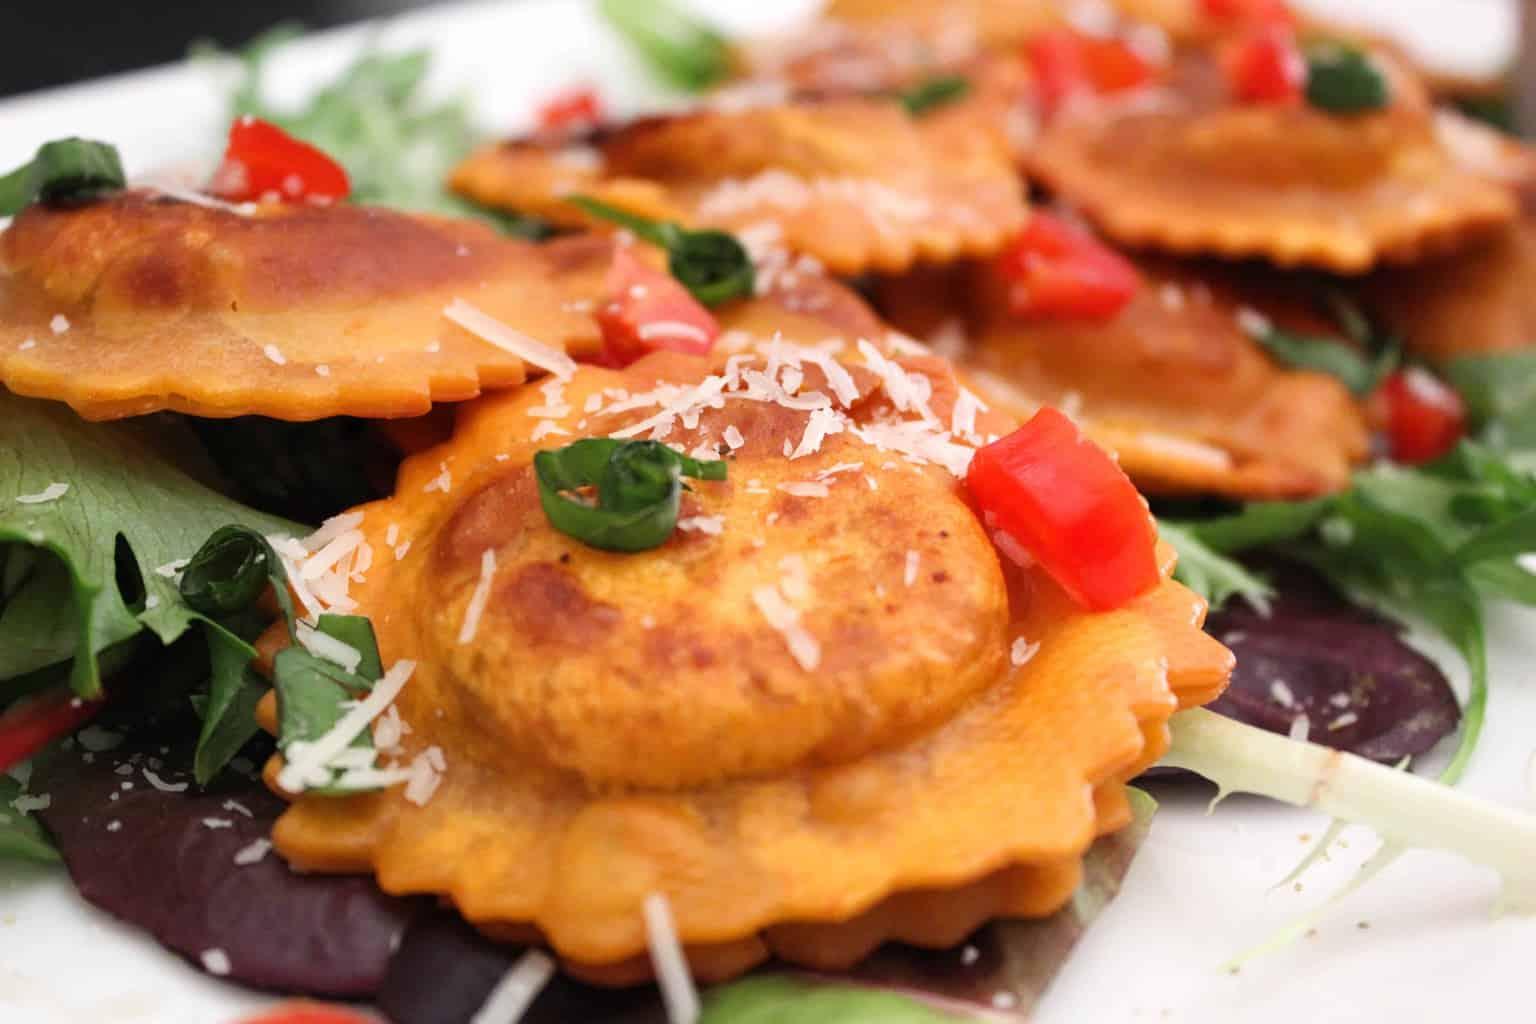 Close up fried ravioli with parmesan cheese, tomato and basil garnish